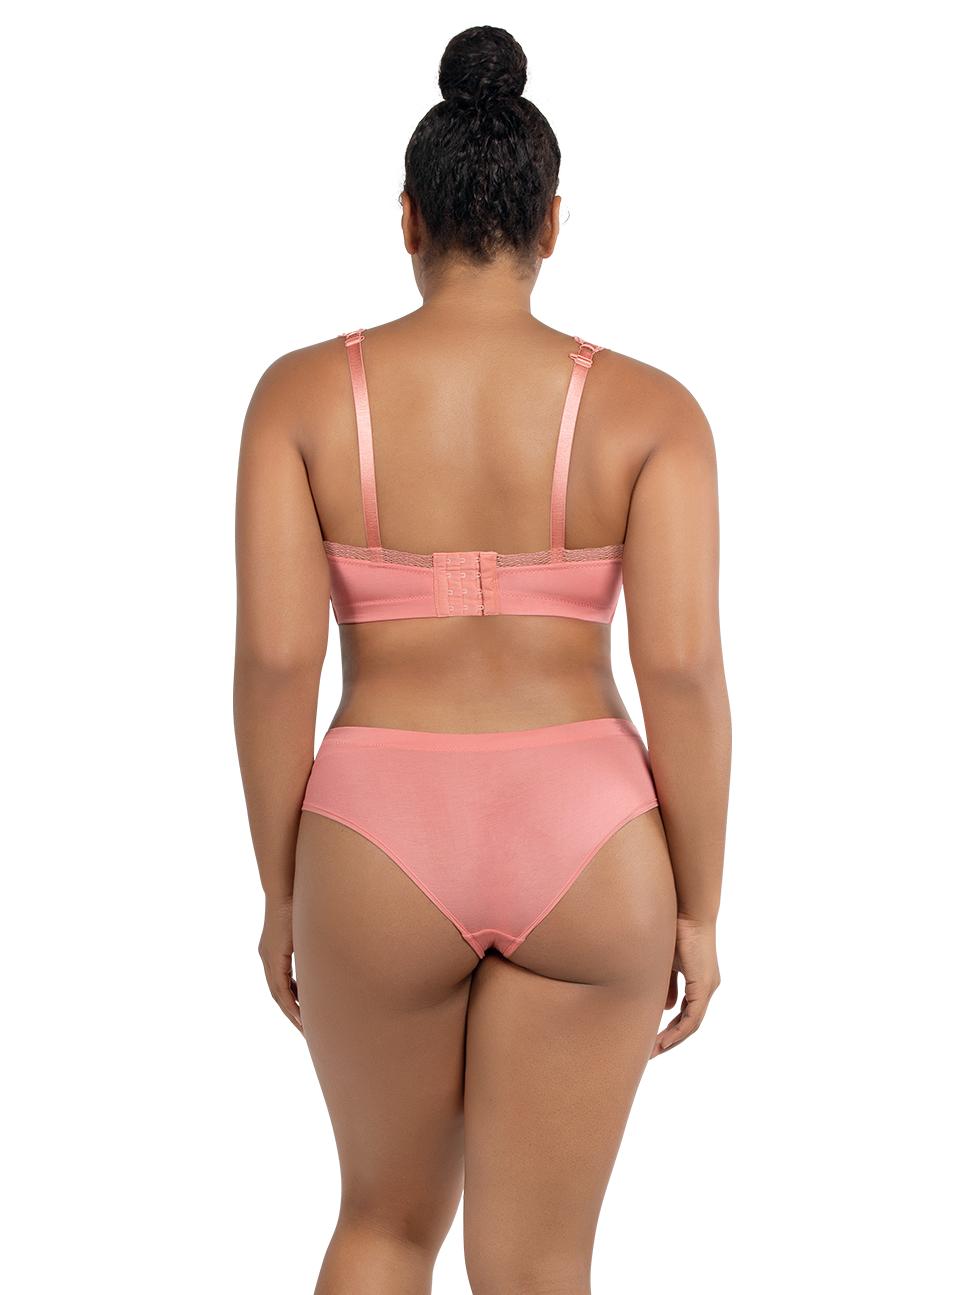 PARFAIT Dalis BraletteP5641 HipsterP5645 PinkBlush Back - Dalis Bralette Pink Blush P5641